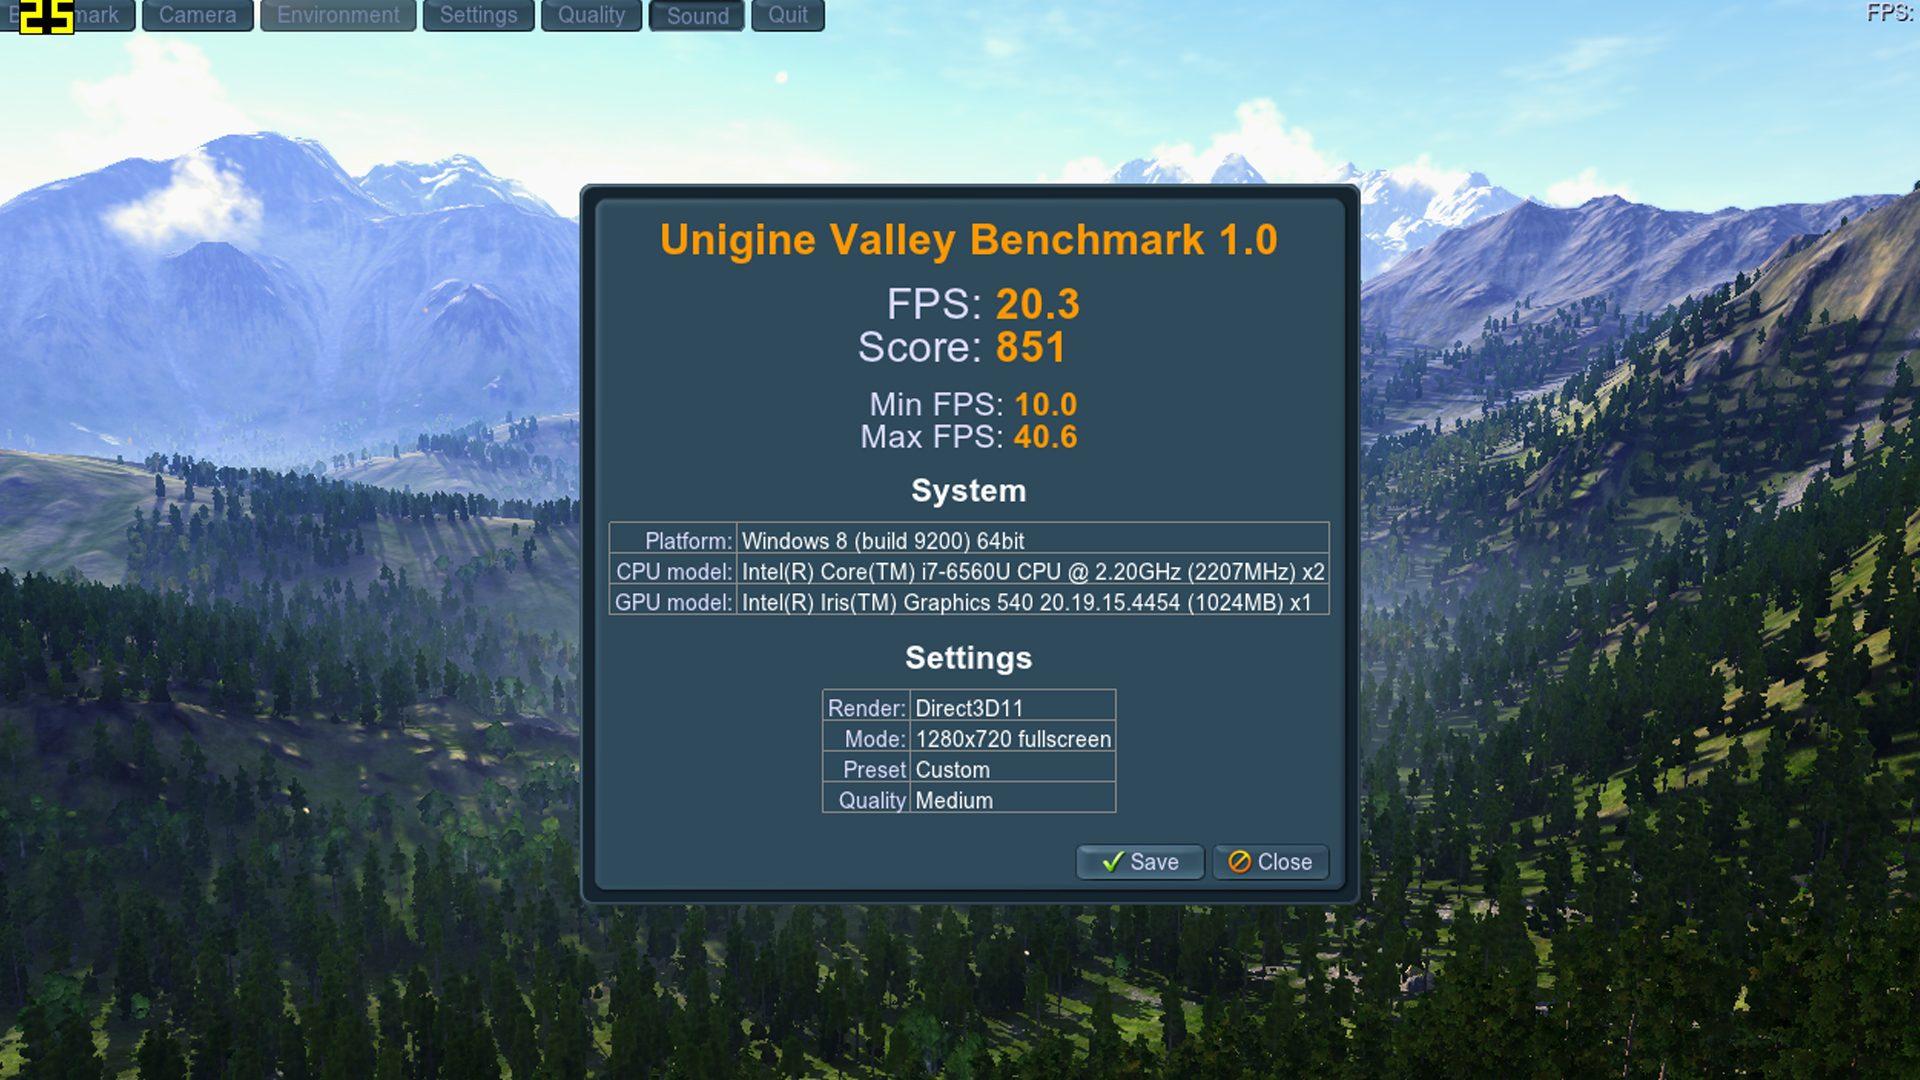 HP-Spectre-x360-OLED-13-4203ng-Grafik_1